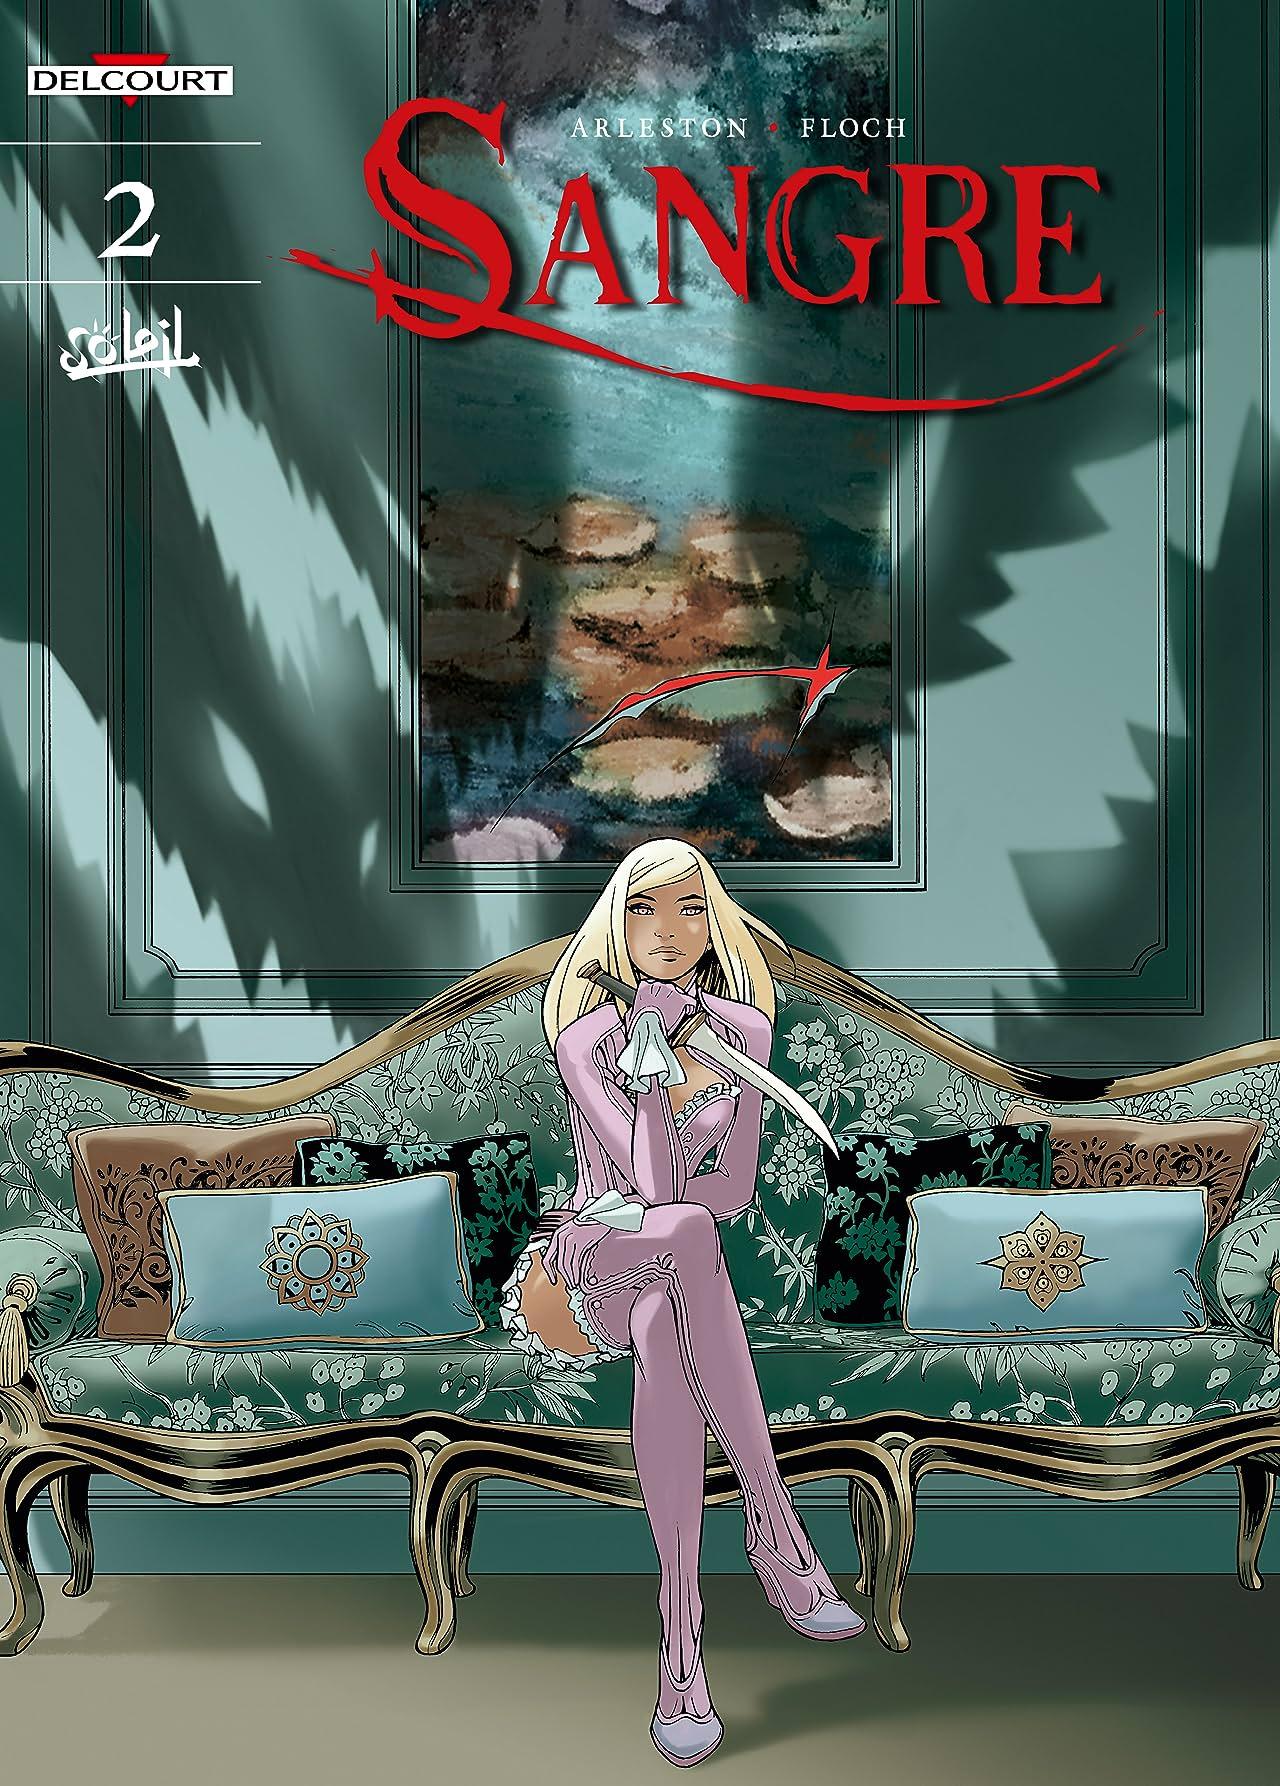 Sangre Vol. 2: Fesolggio the Inexorable Nuisance